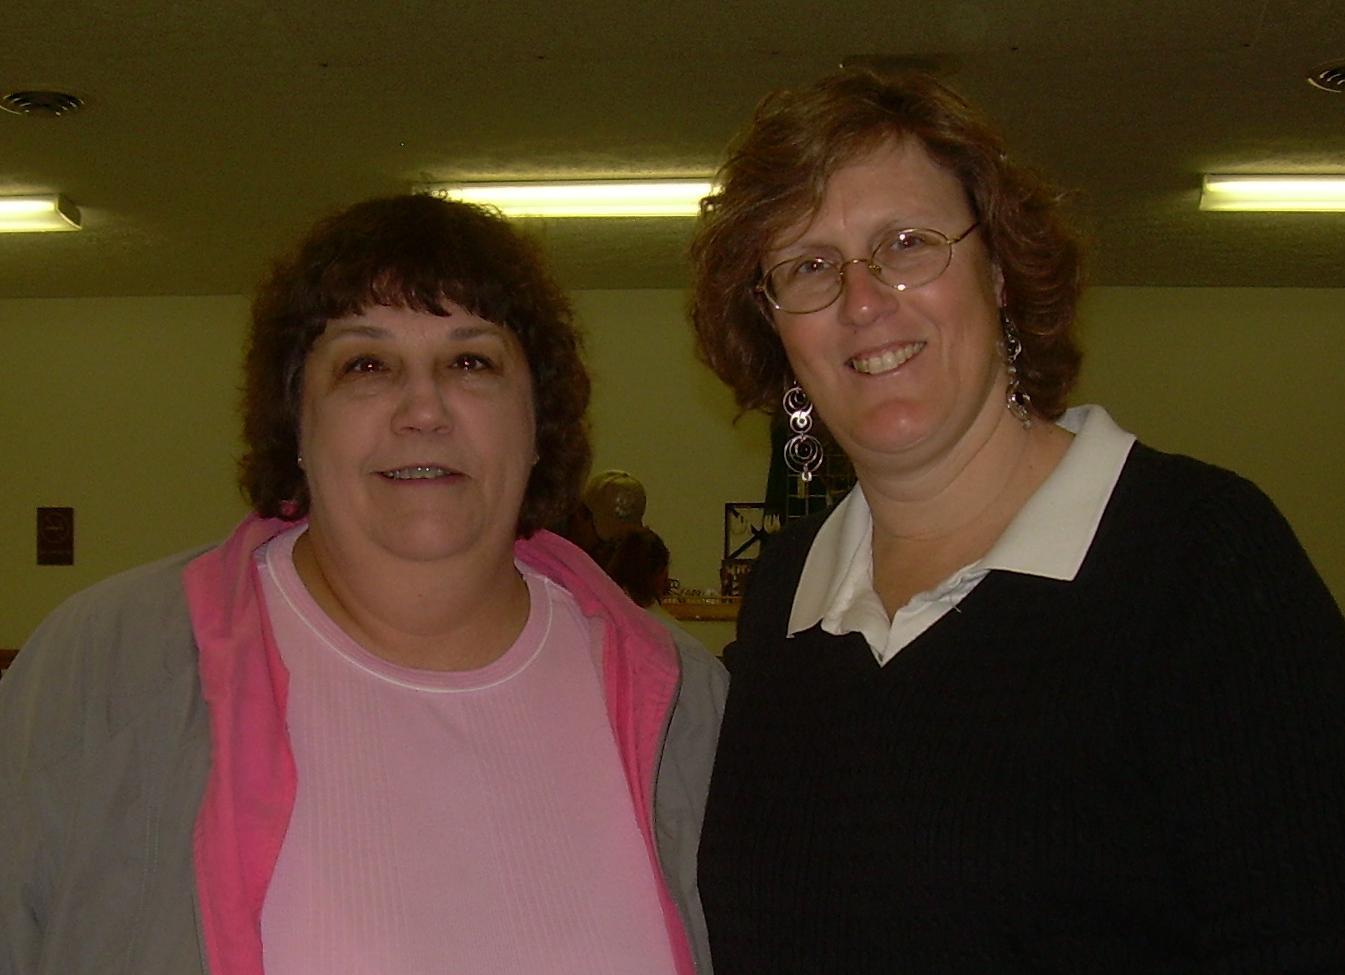 Me and Molly Daniels/Kenzie Michaels